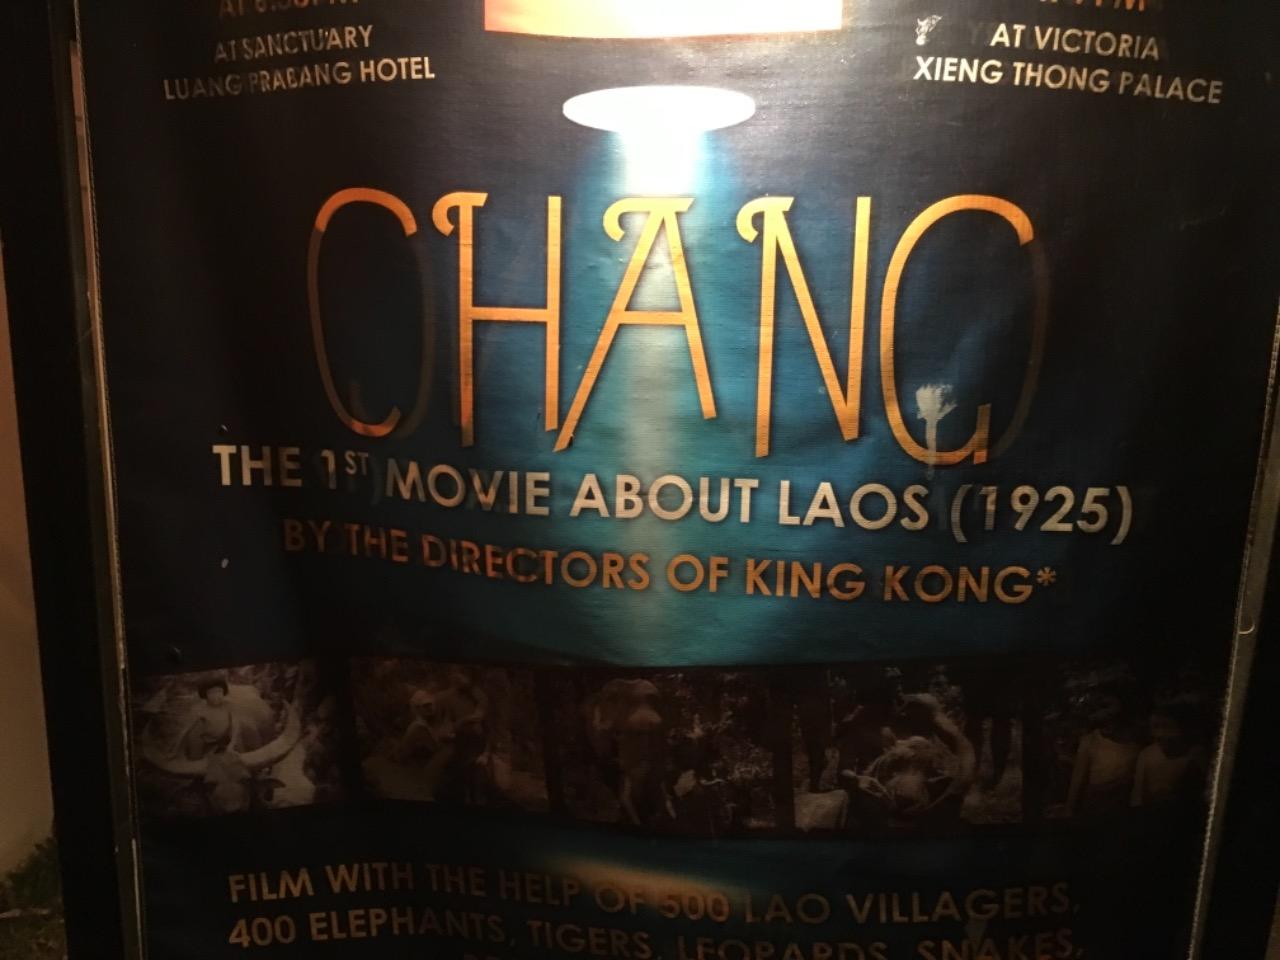 Chang: Der älteste Film über Laos – angeblich